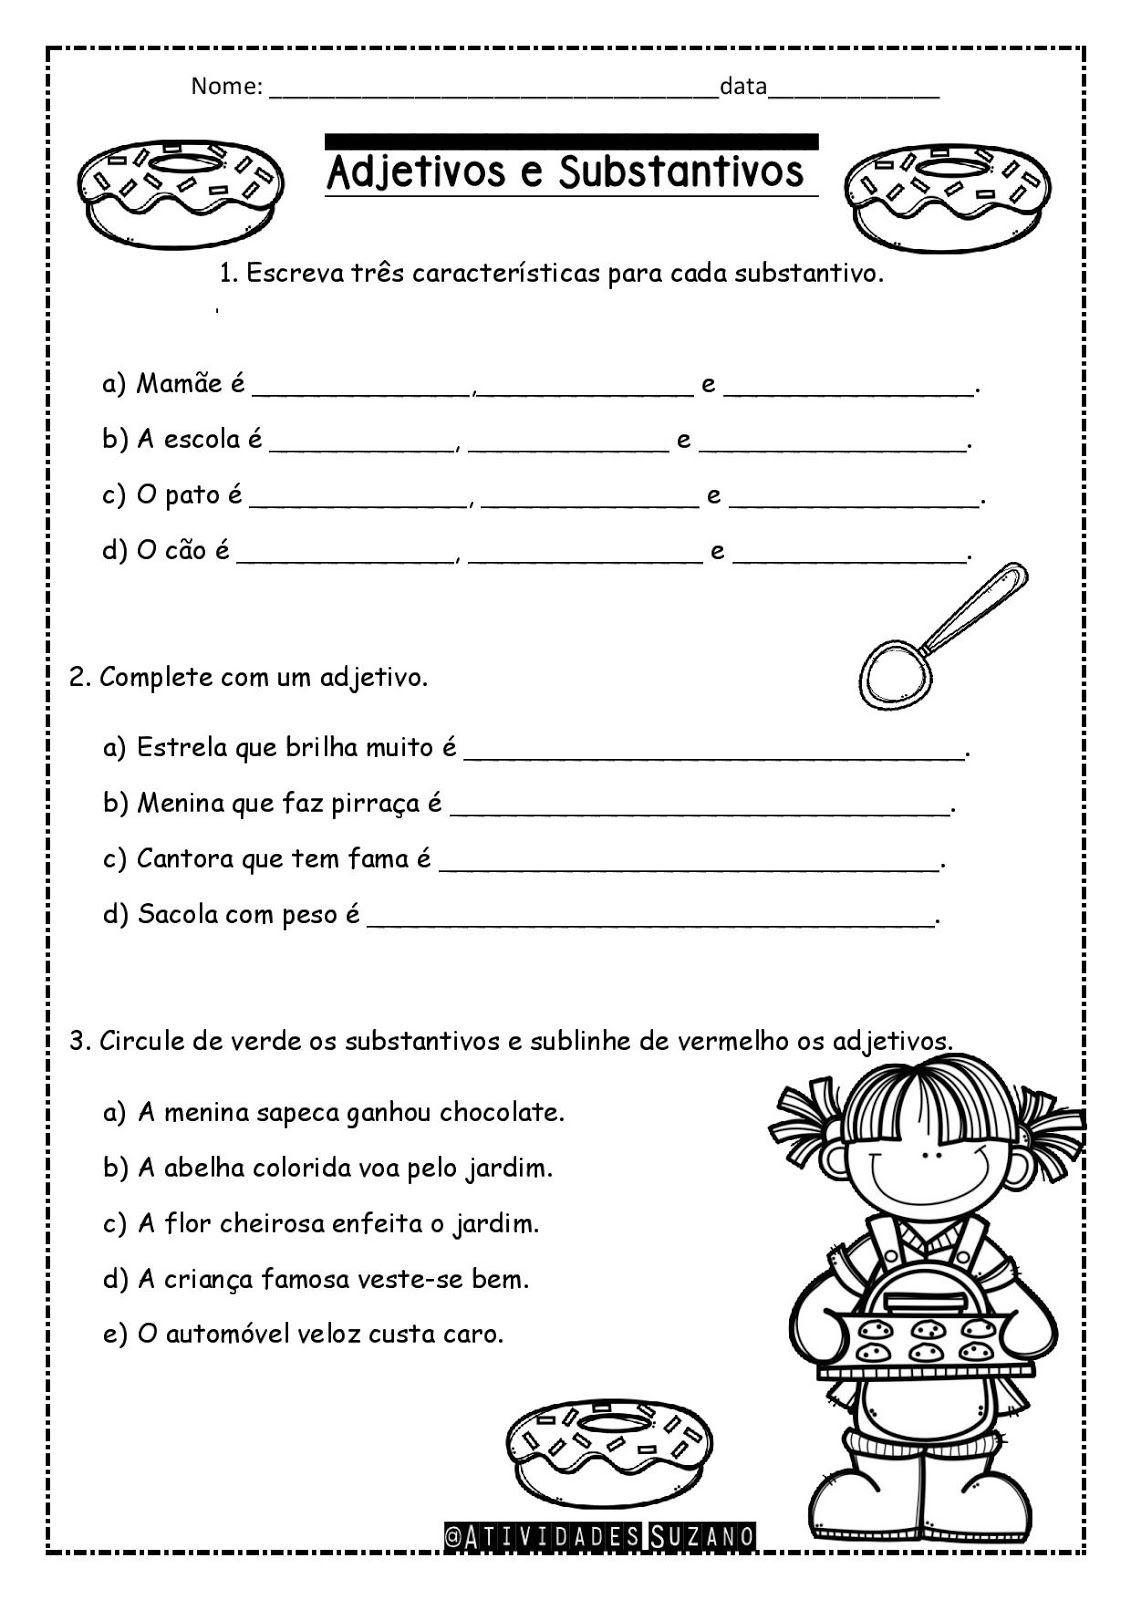 Pin De Mina Yamaga Em Portugues Atividades Adjetivos Adjetivos